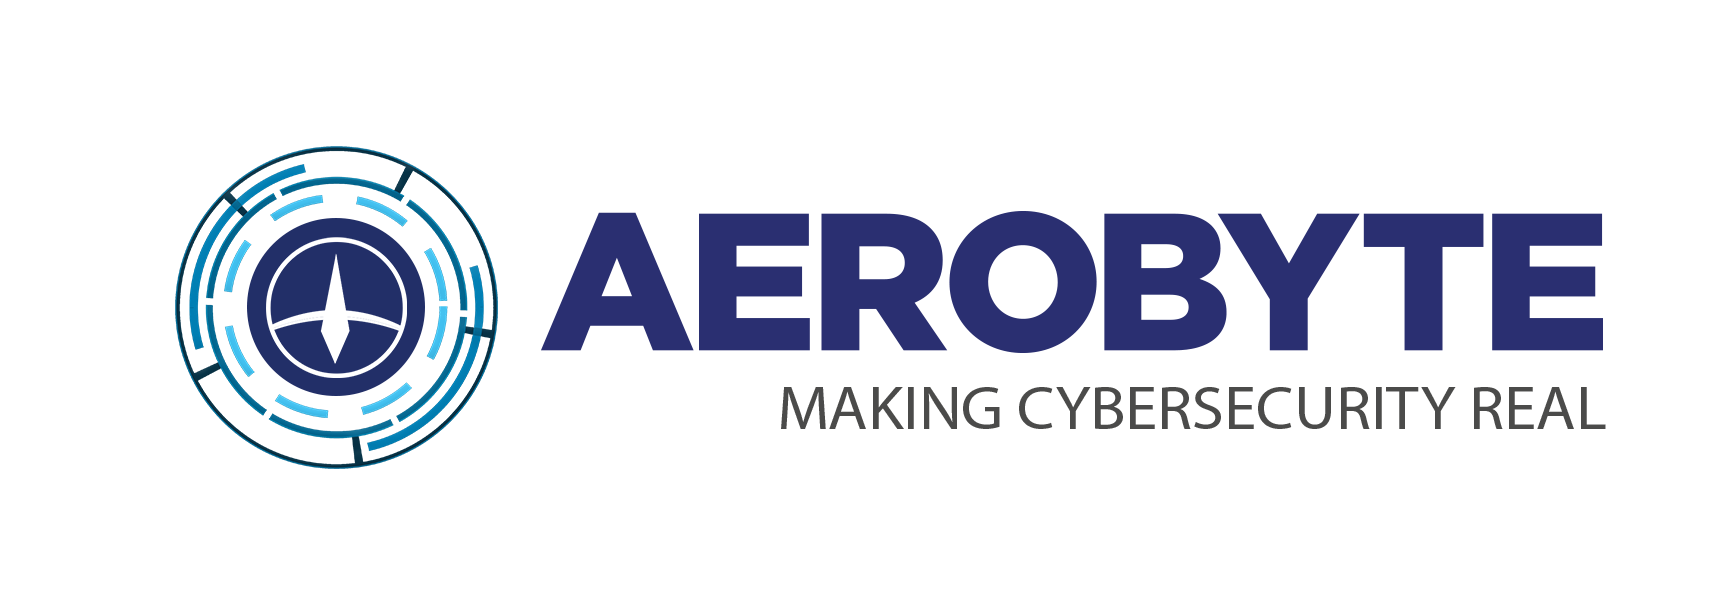 Aerobyte Cyber